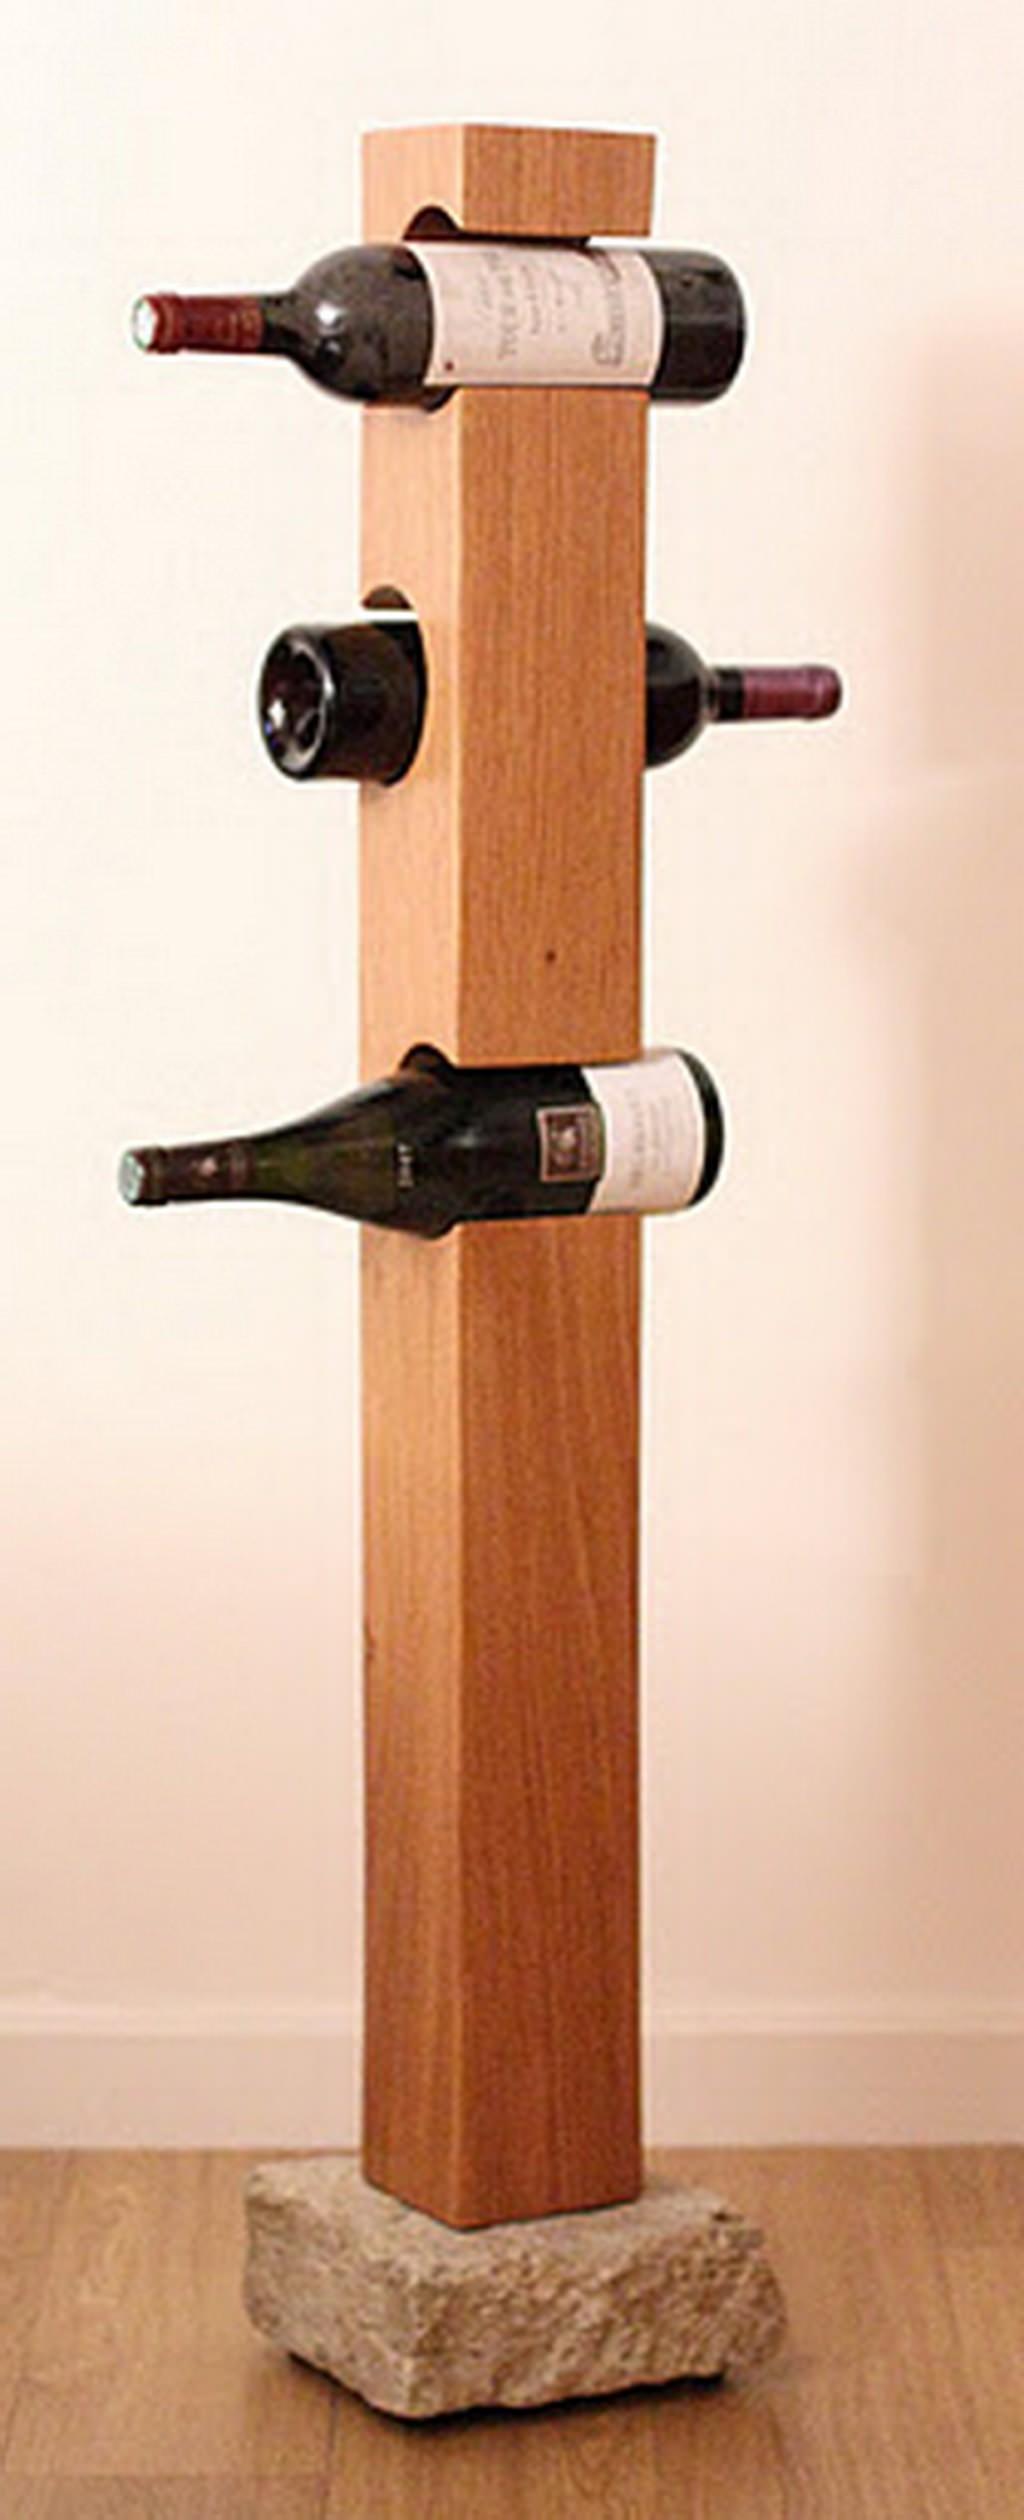 mobilier sur mesure lynium metz presentoir a vin. Black Bedroom Furniture Sets. Home Design Ideas